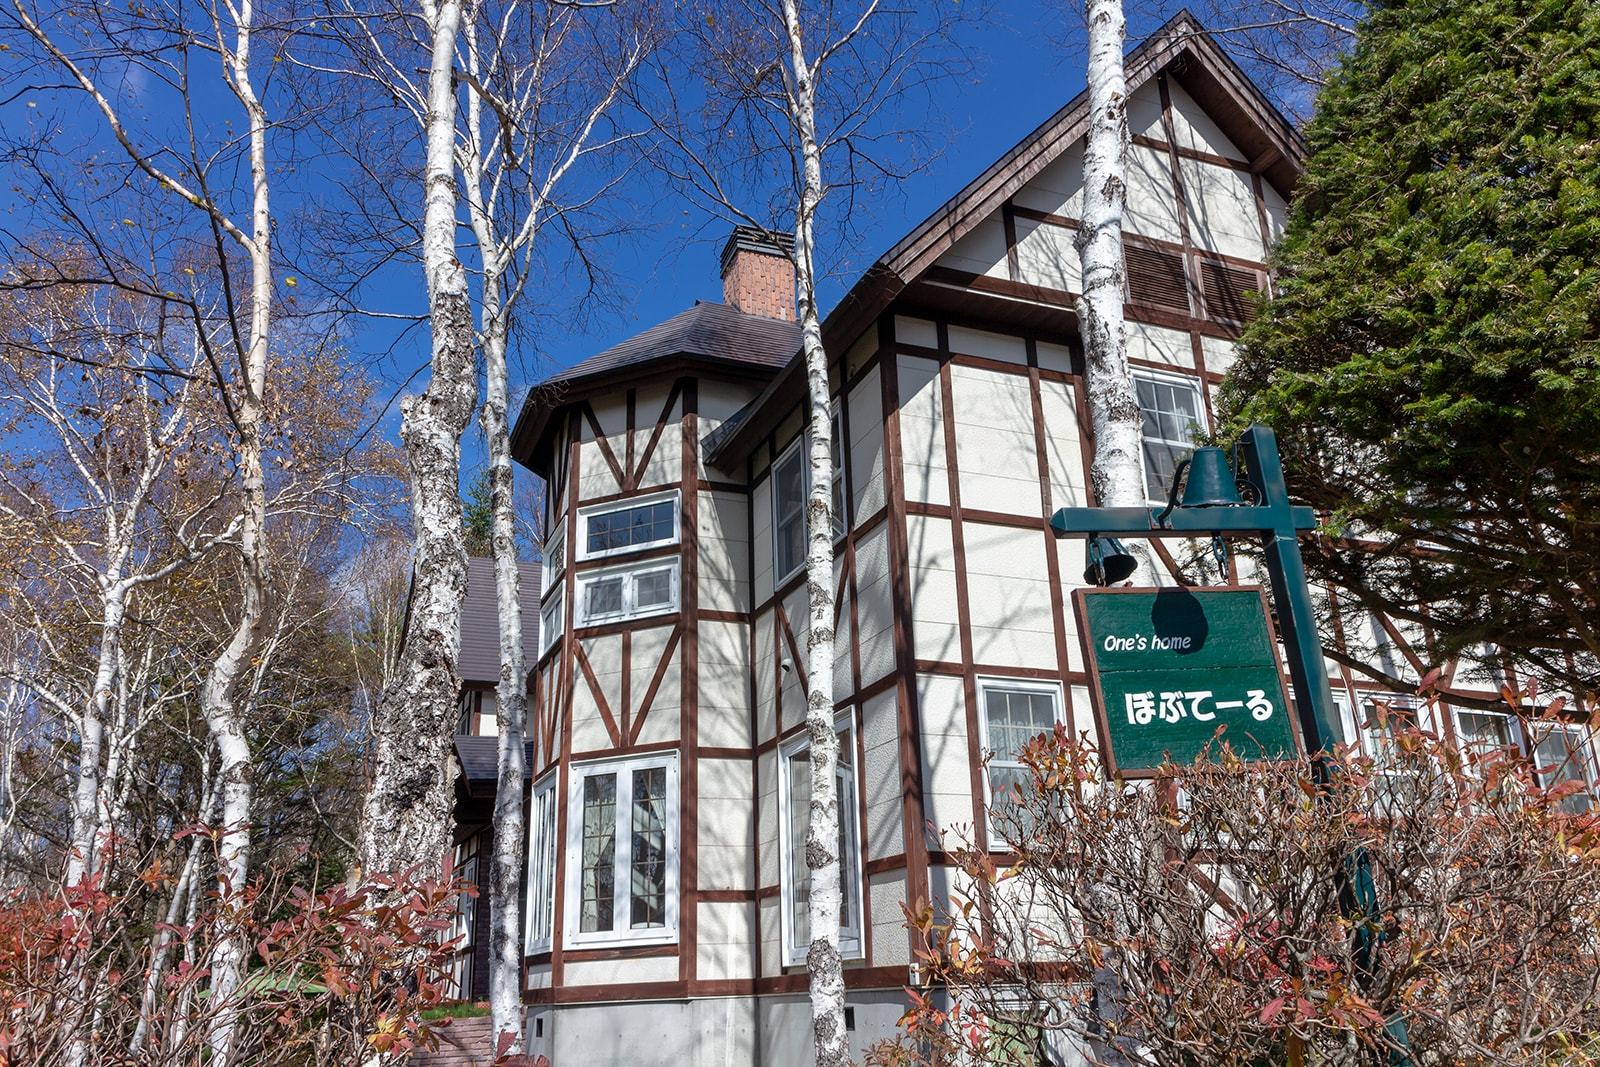 One's home=故郷をコンセプトにした白樺高原の宿泊施設